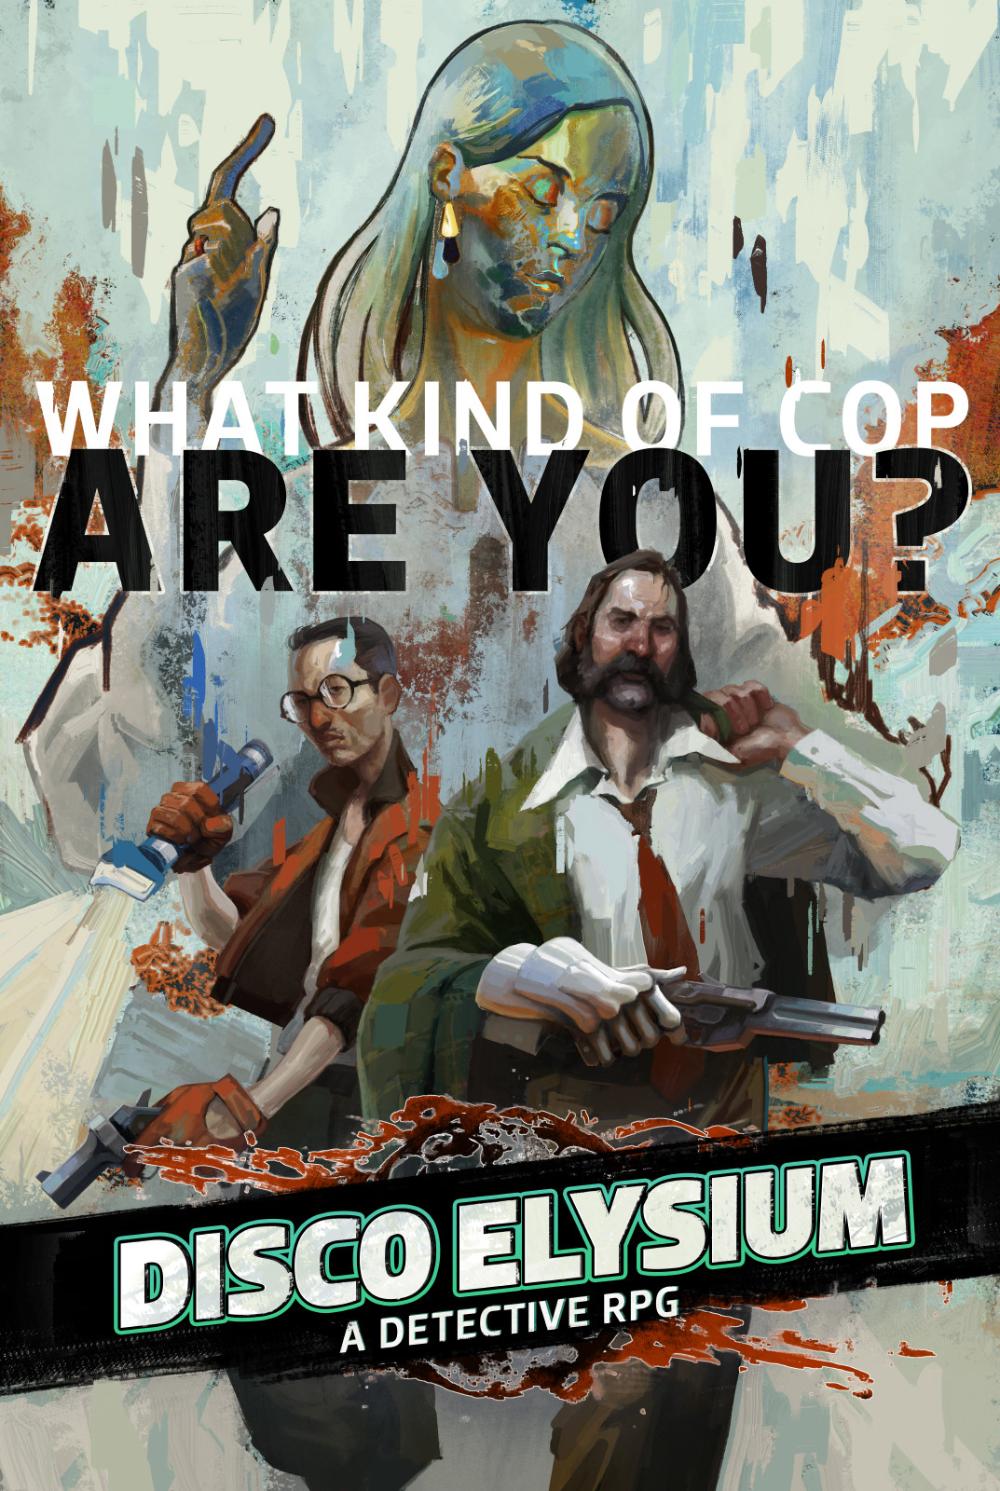 ArtStation Disco Elysium Cover Art, Aleksander Rostov